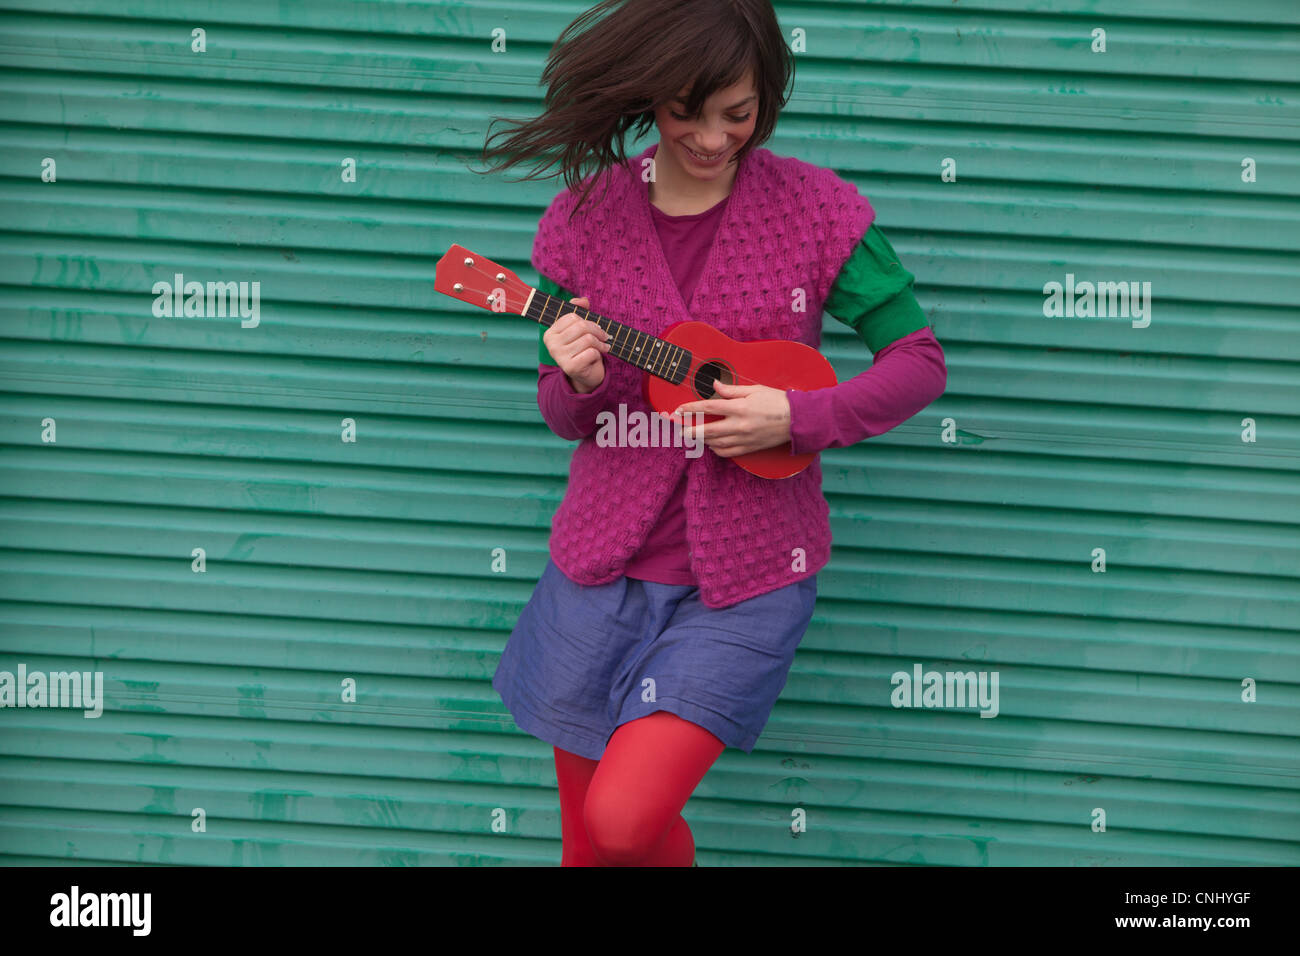 Young woman playing ukulele Photo Stock